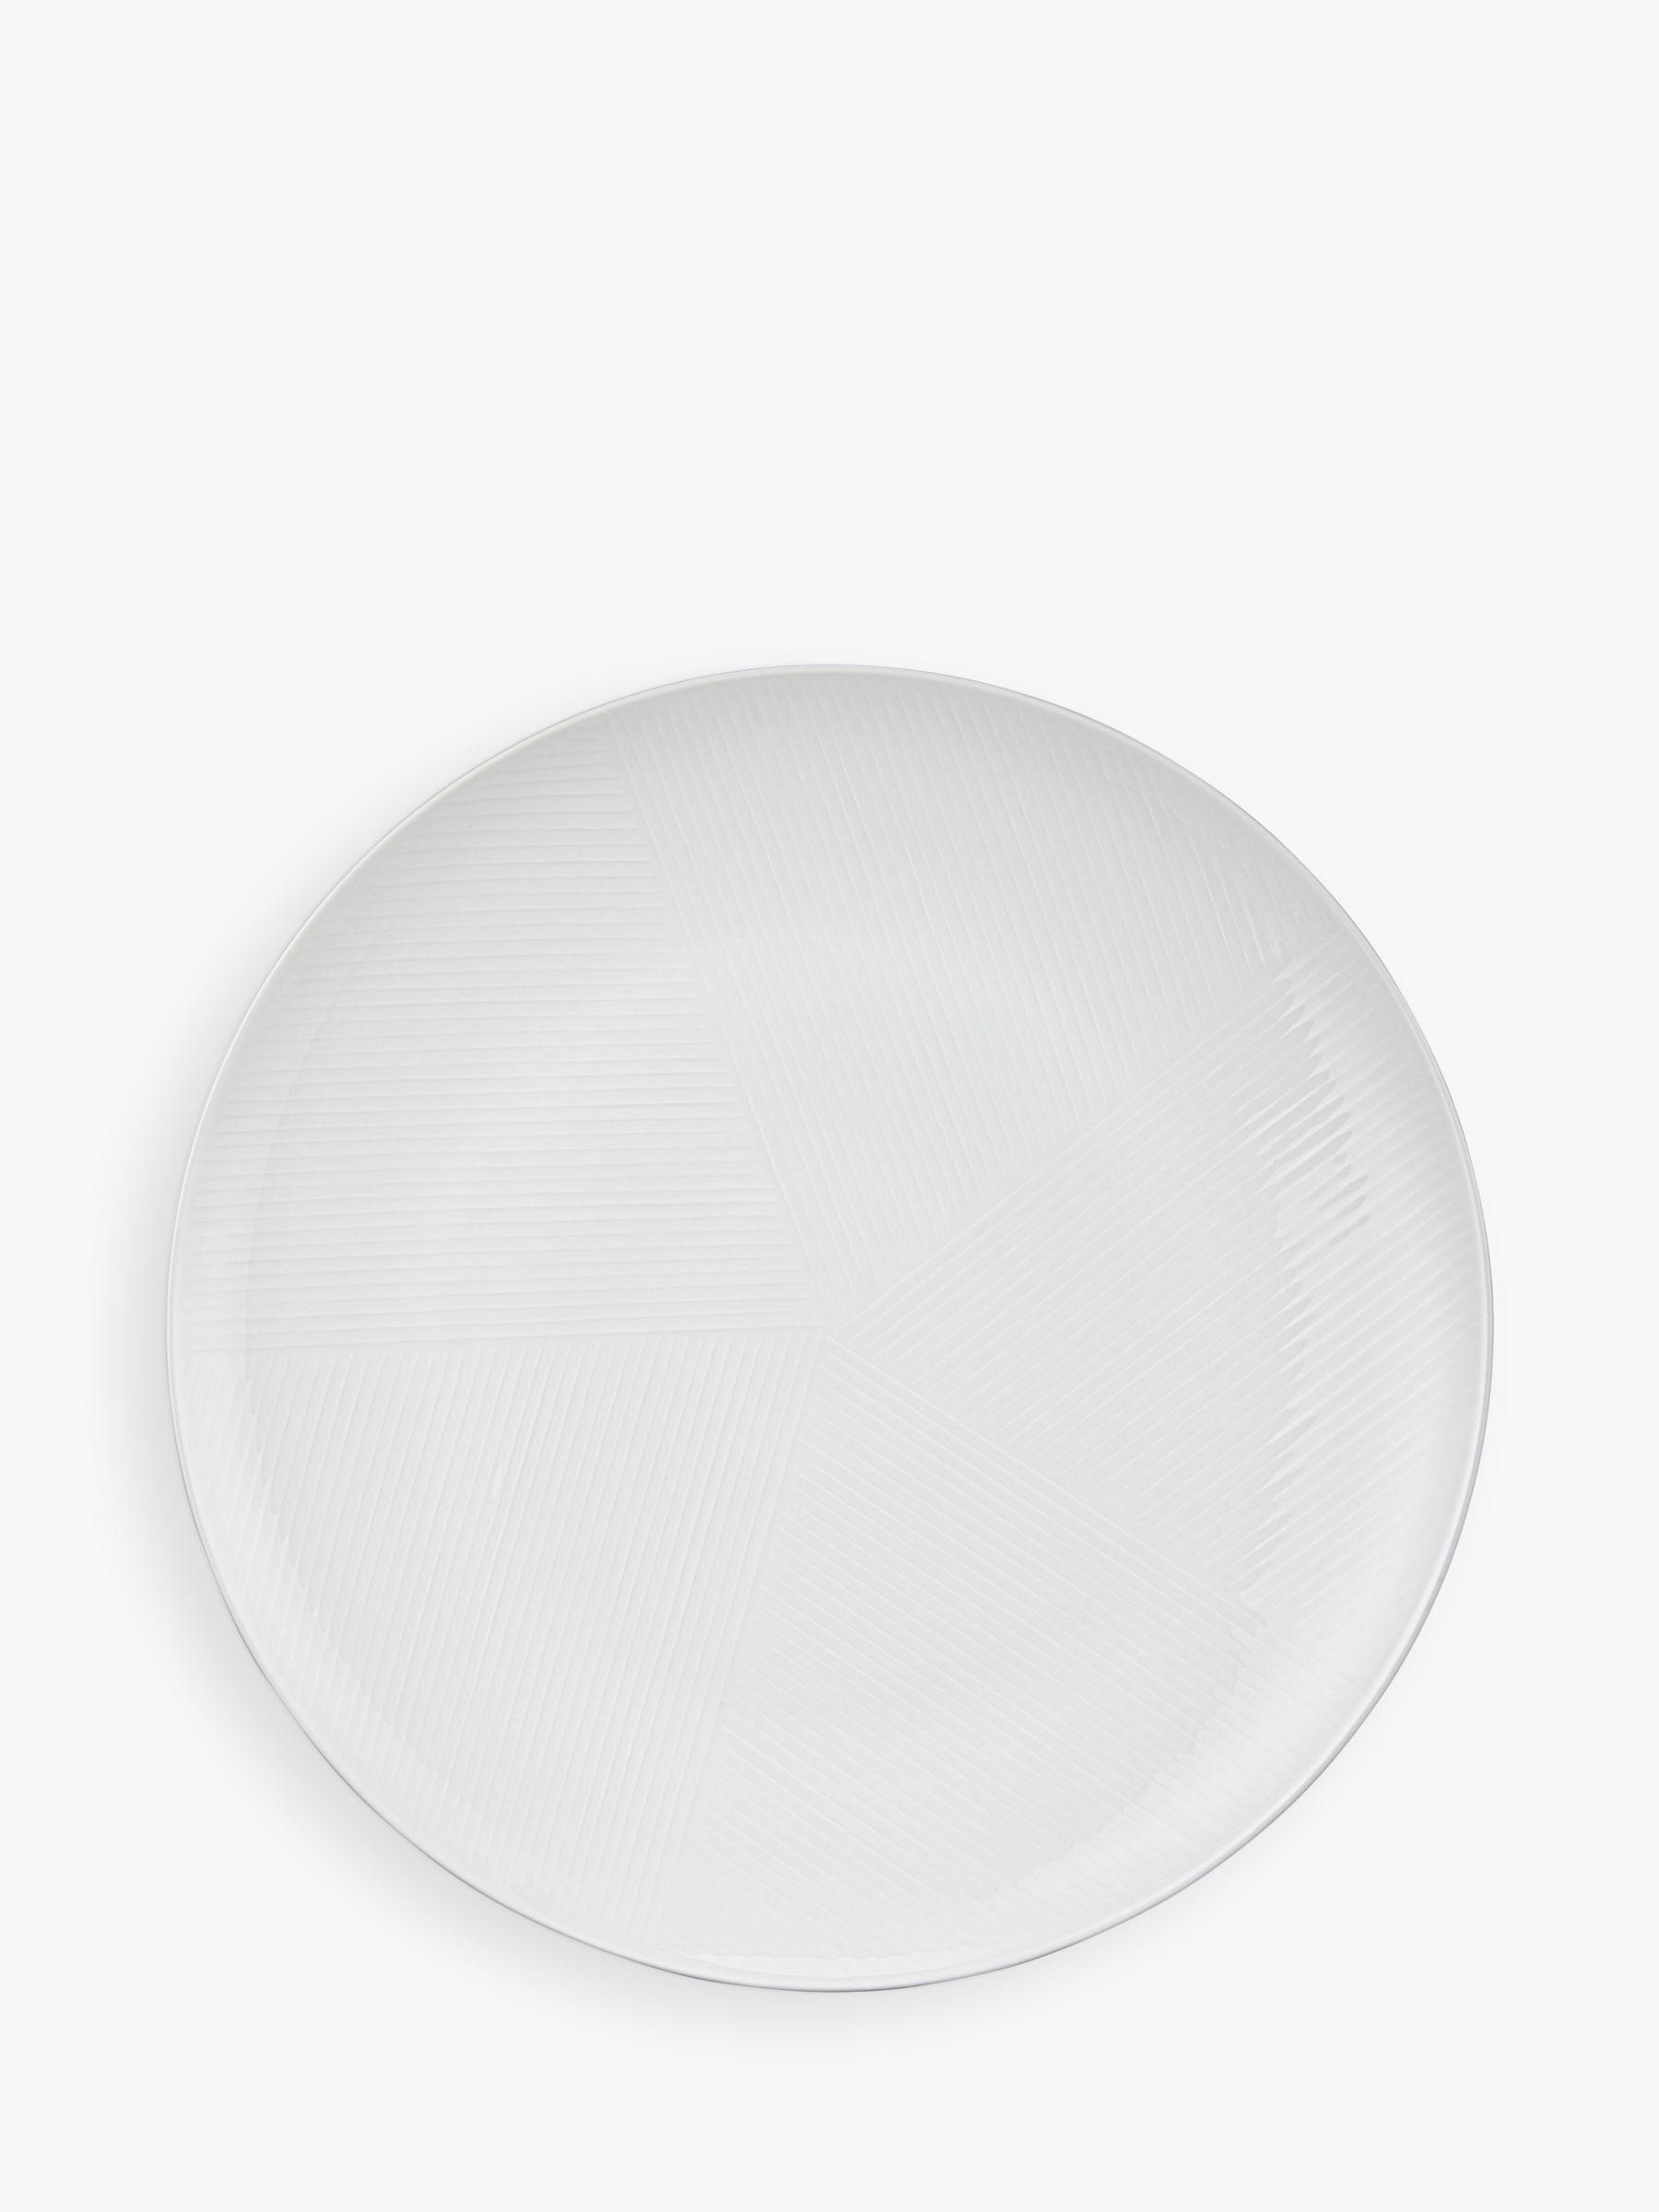 Design Project by John Lewis Design Project by John Lewis No.098 34cm Platter